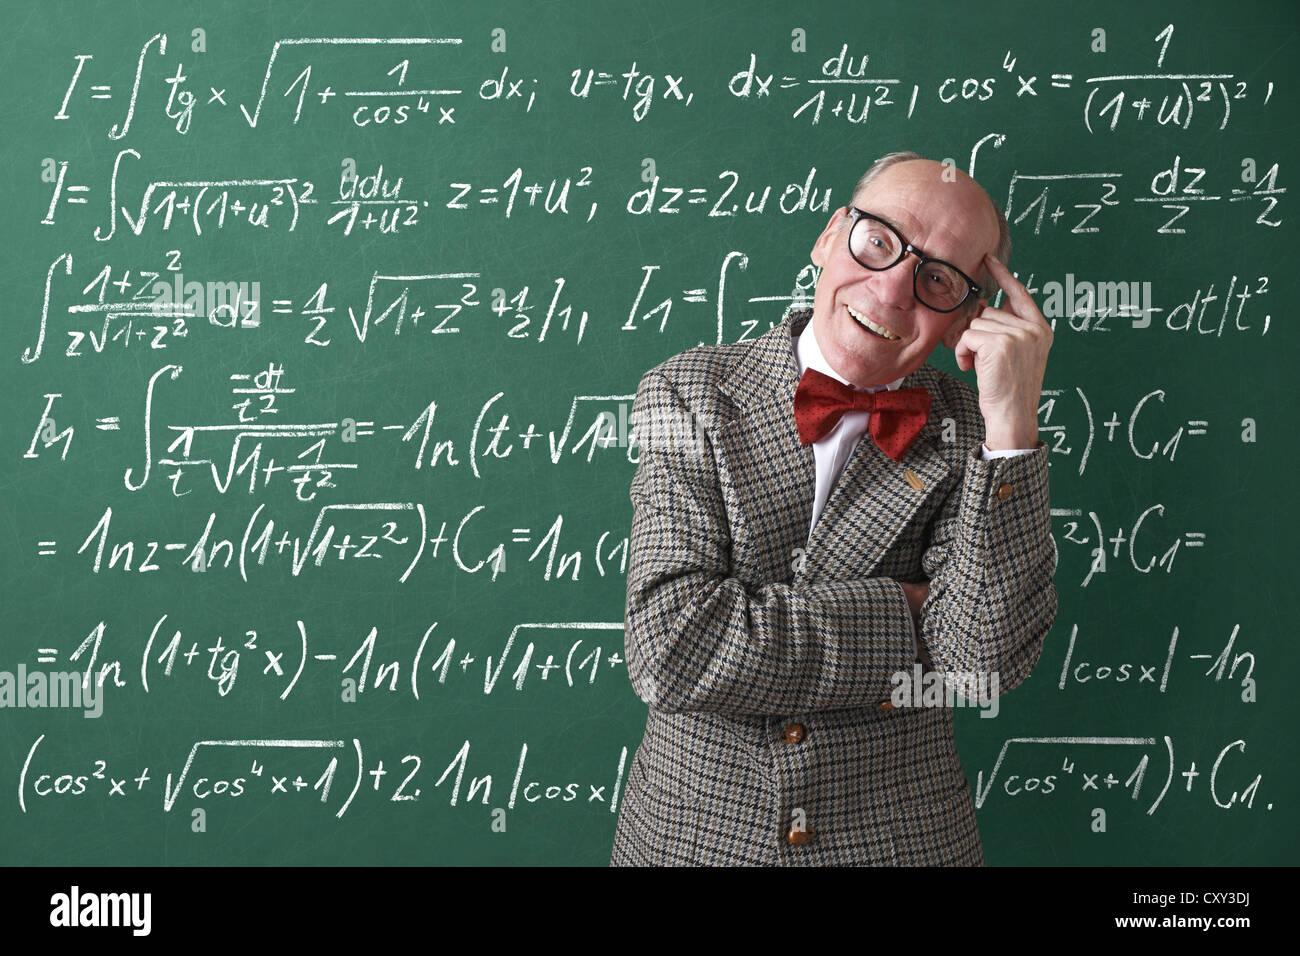 Worksheet Mathematic Lessons professor teacher blackboard mathematic formulas equations lessons maths